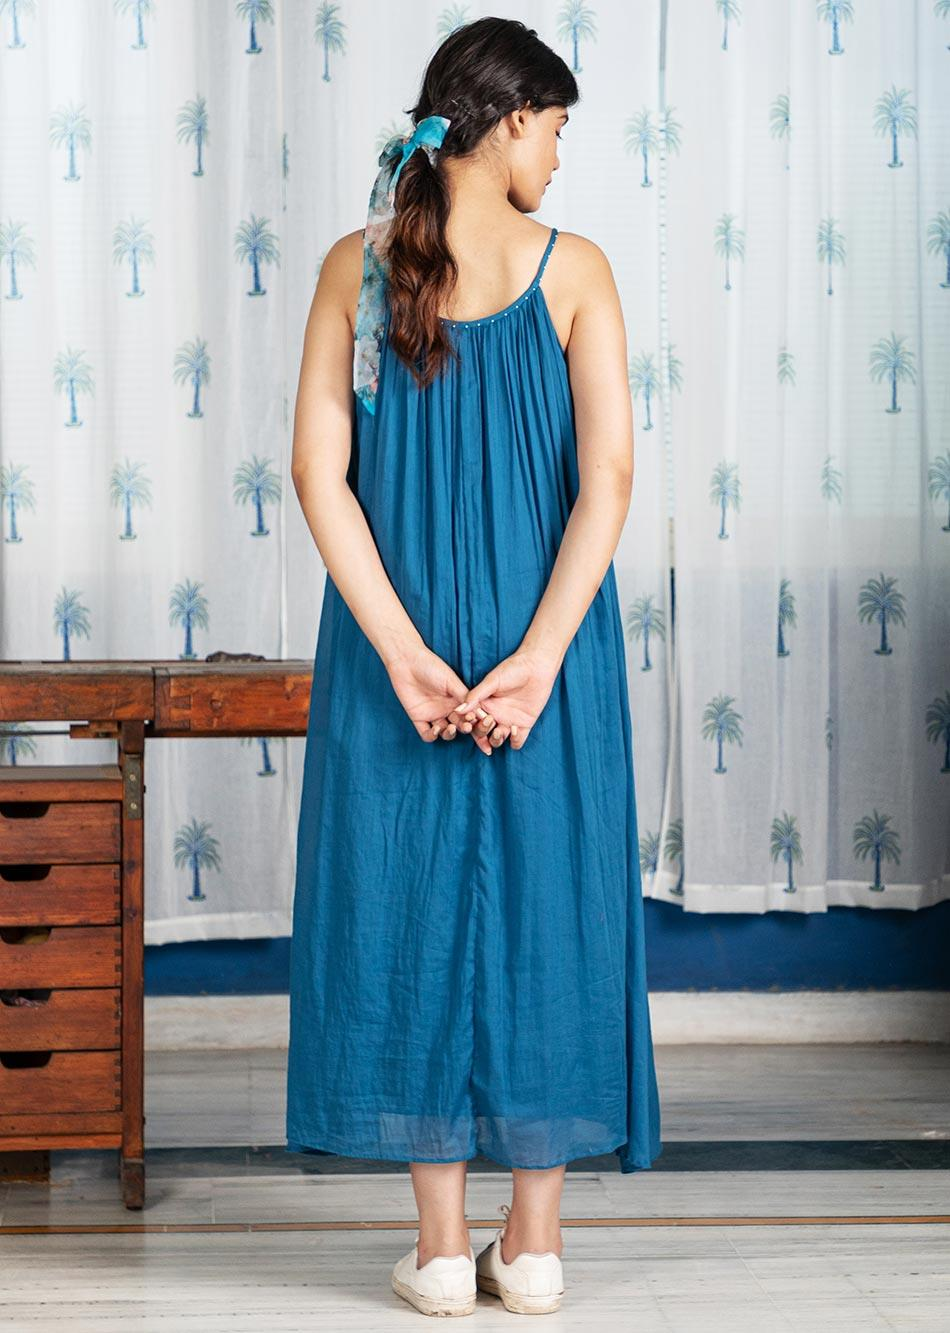 PINE MINE DRESS  By Jovi Fashion